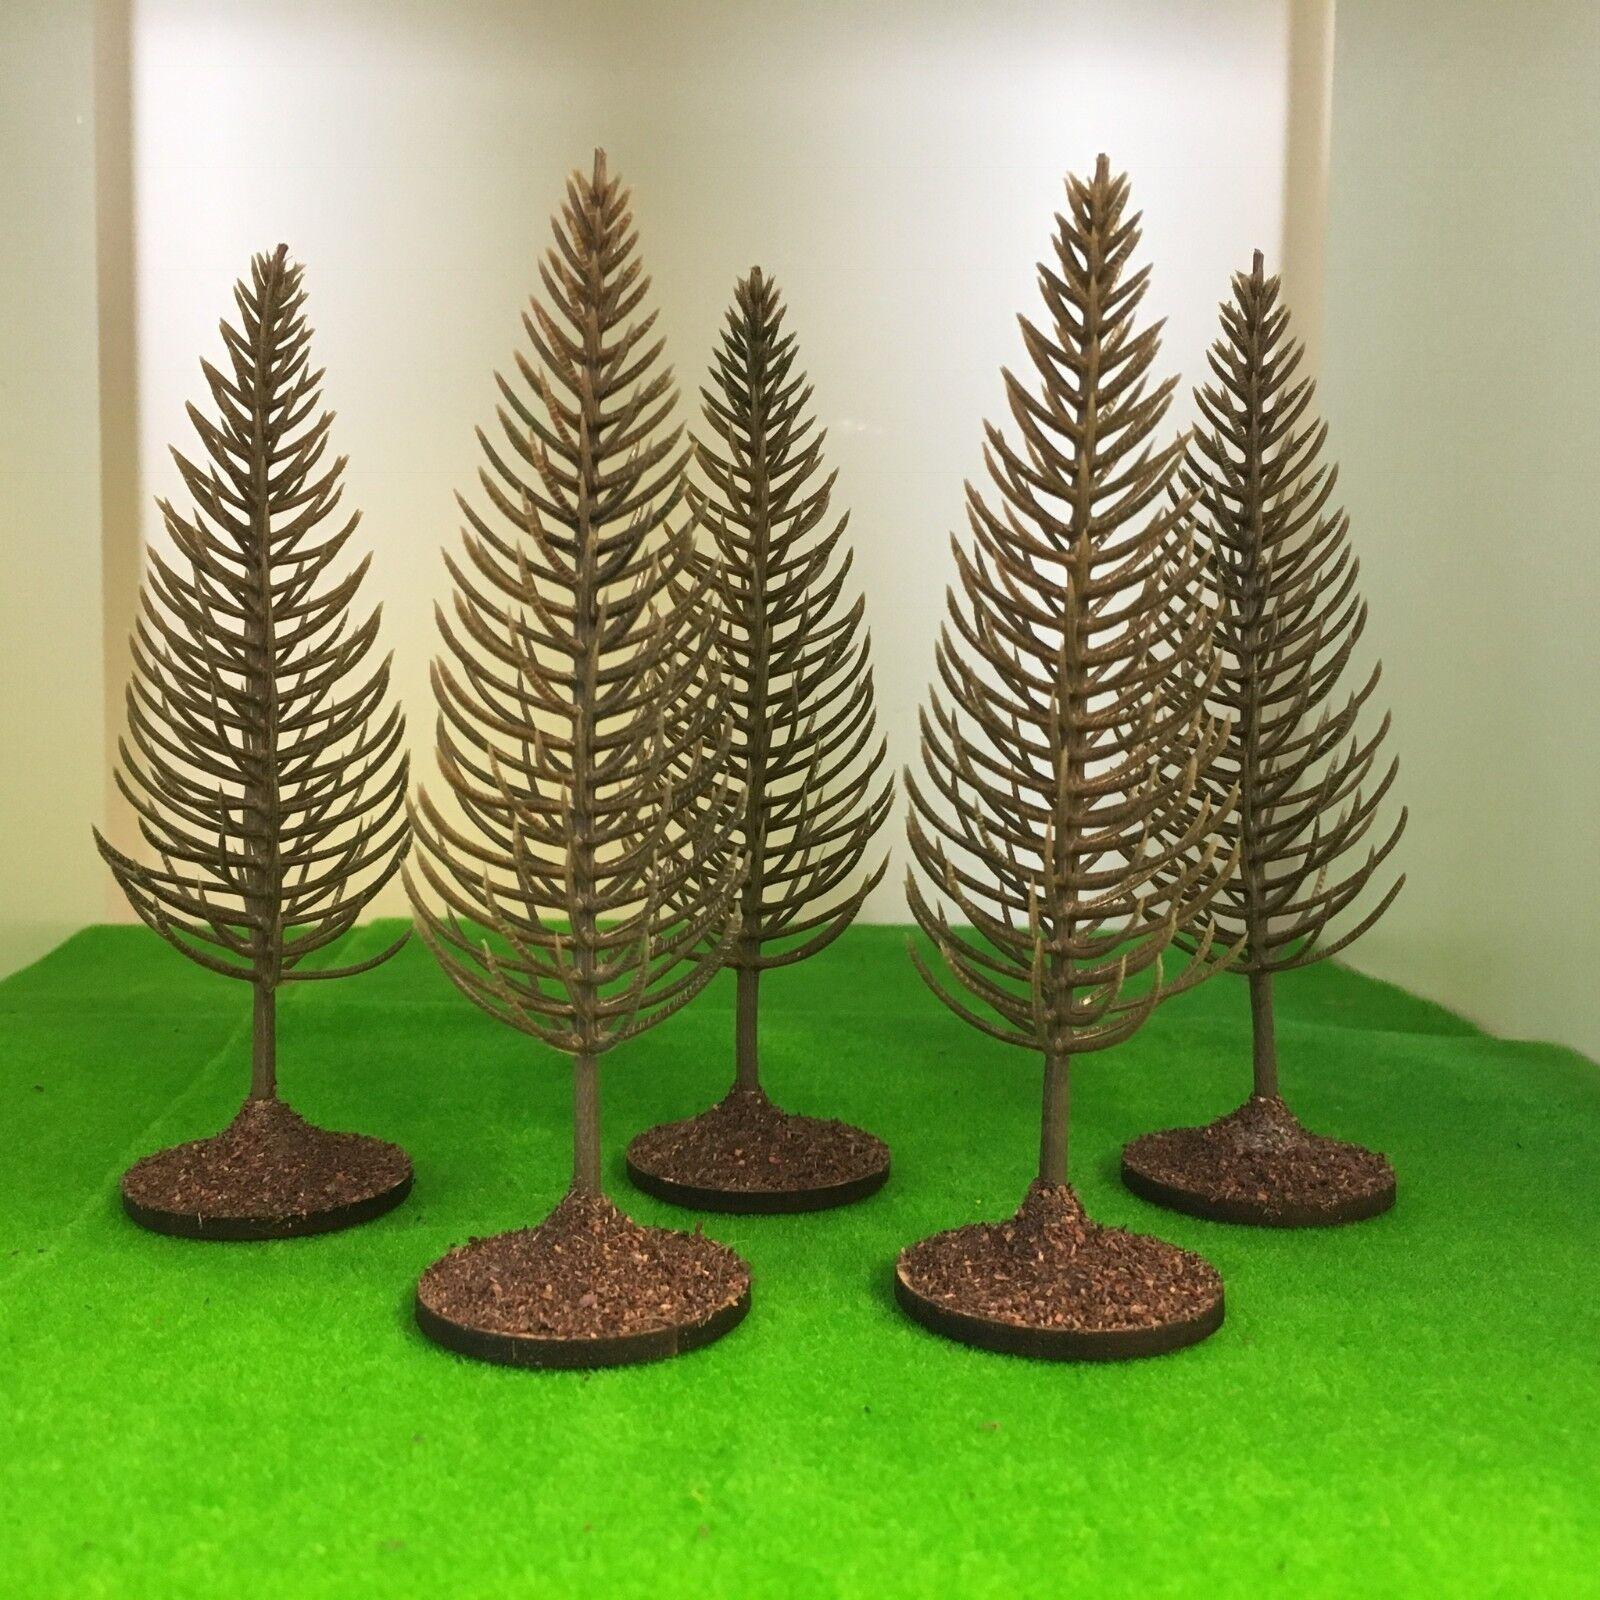 Bare Bare Bare Pine Trees on bases - Plastic Model Scenery Railway Wargames plastic OO HO dedf07